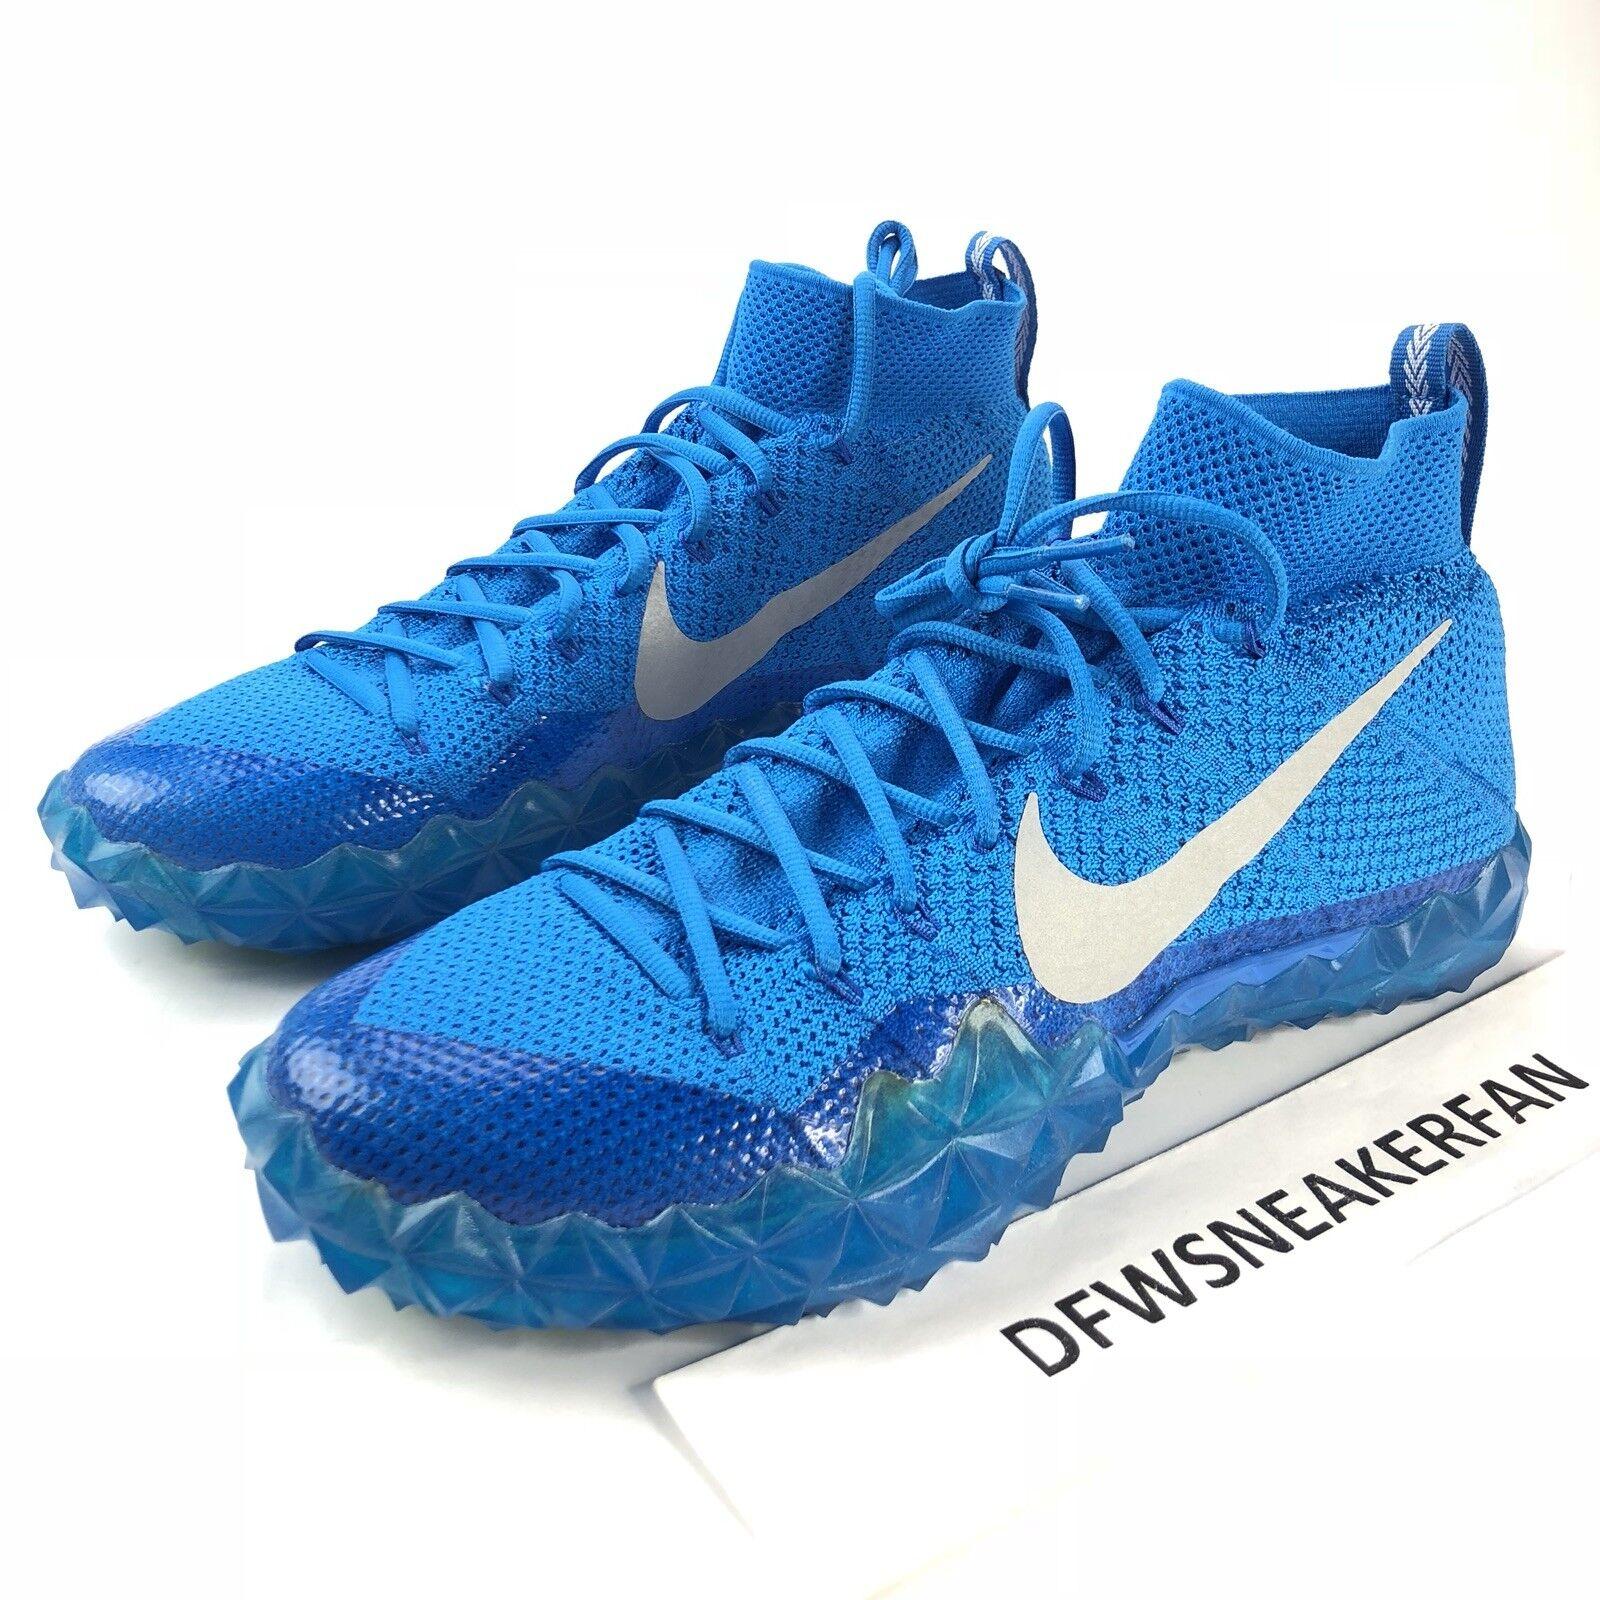 Nike Alpha Sensory Turf Football shoes Men's Size Size Size 10.5 Photo bluee 854312-404 New 71c0fc